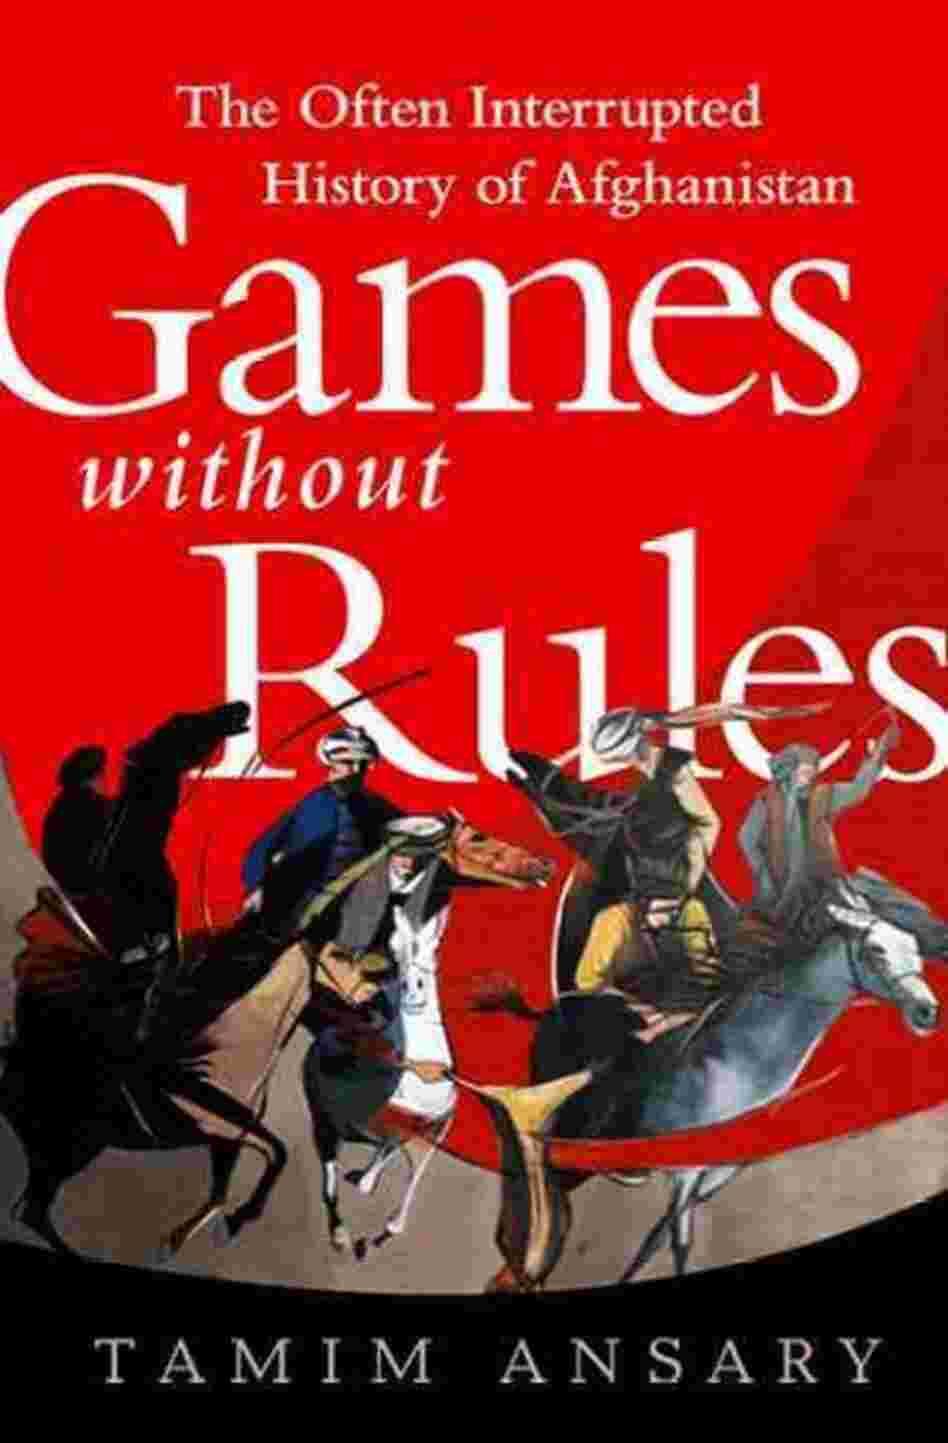 https://i1.wp.com/media.npr.org/assets/bakertaylor/covers/g/games-without-rules/9781610390941_custom-0d7ccaf8e4eb7254ba5e95b45889a5c8fff78182-s6-c10.jpg